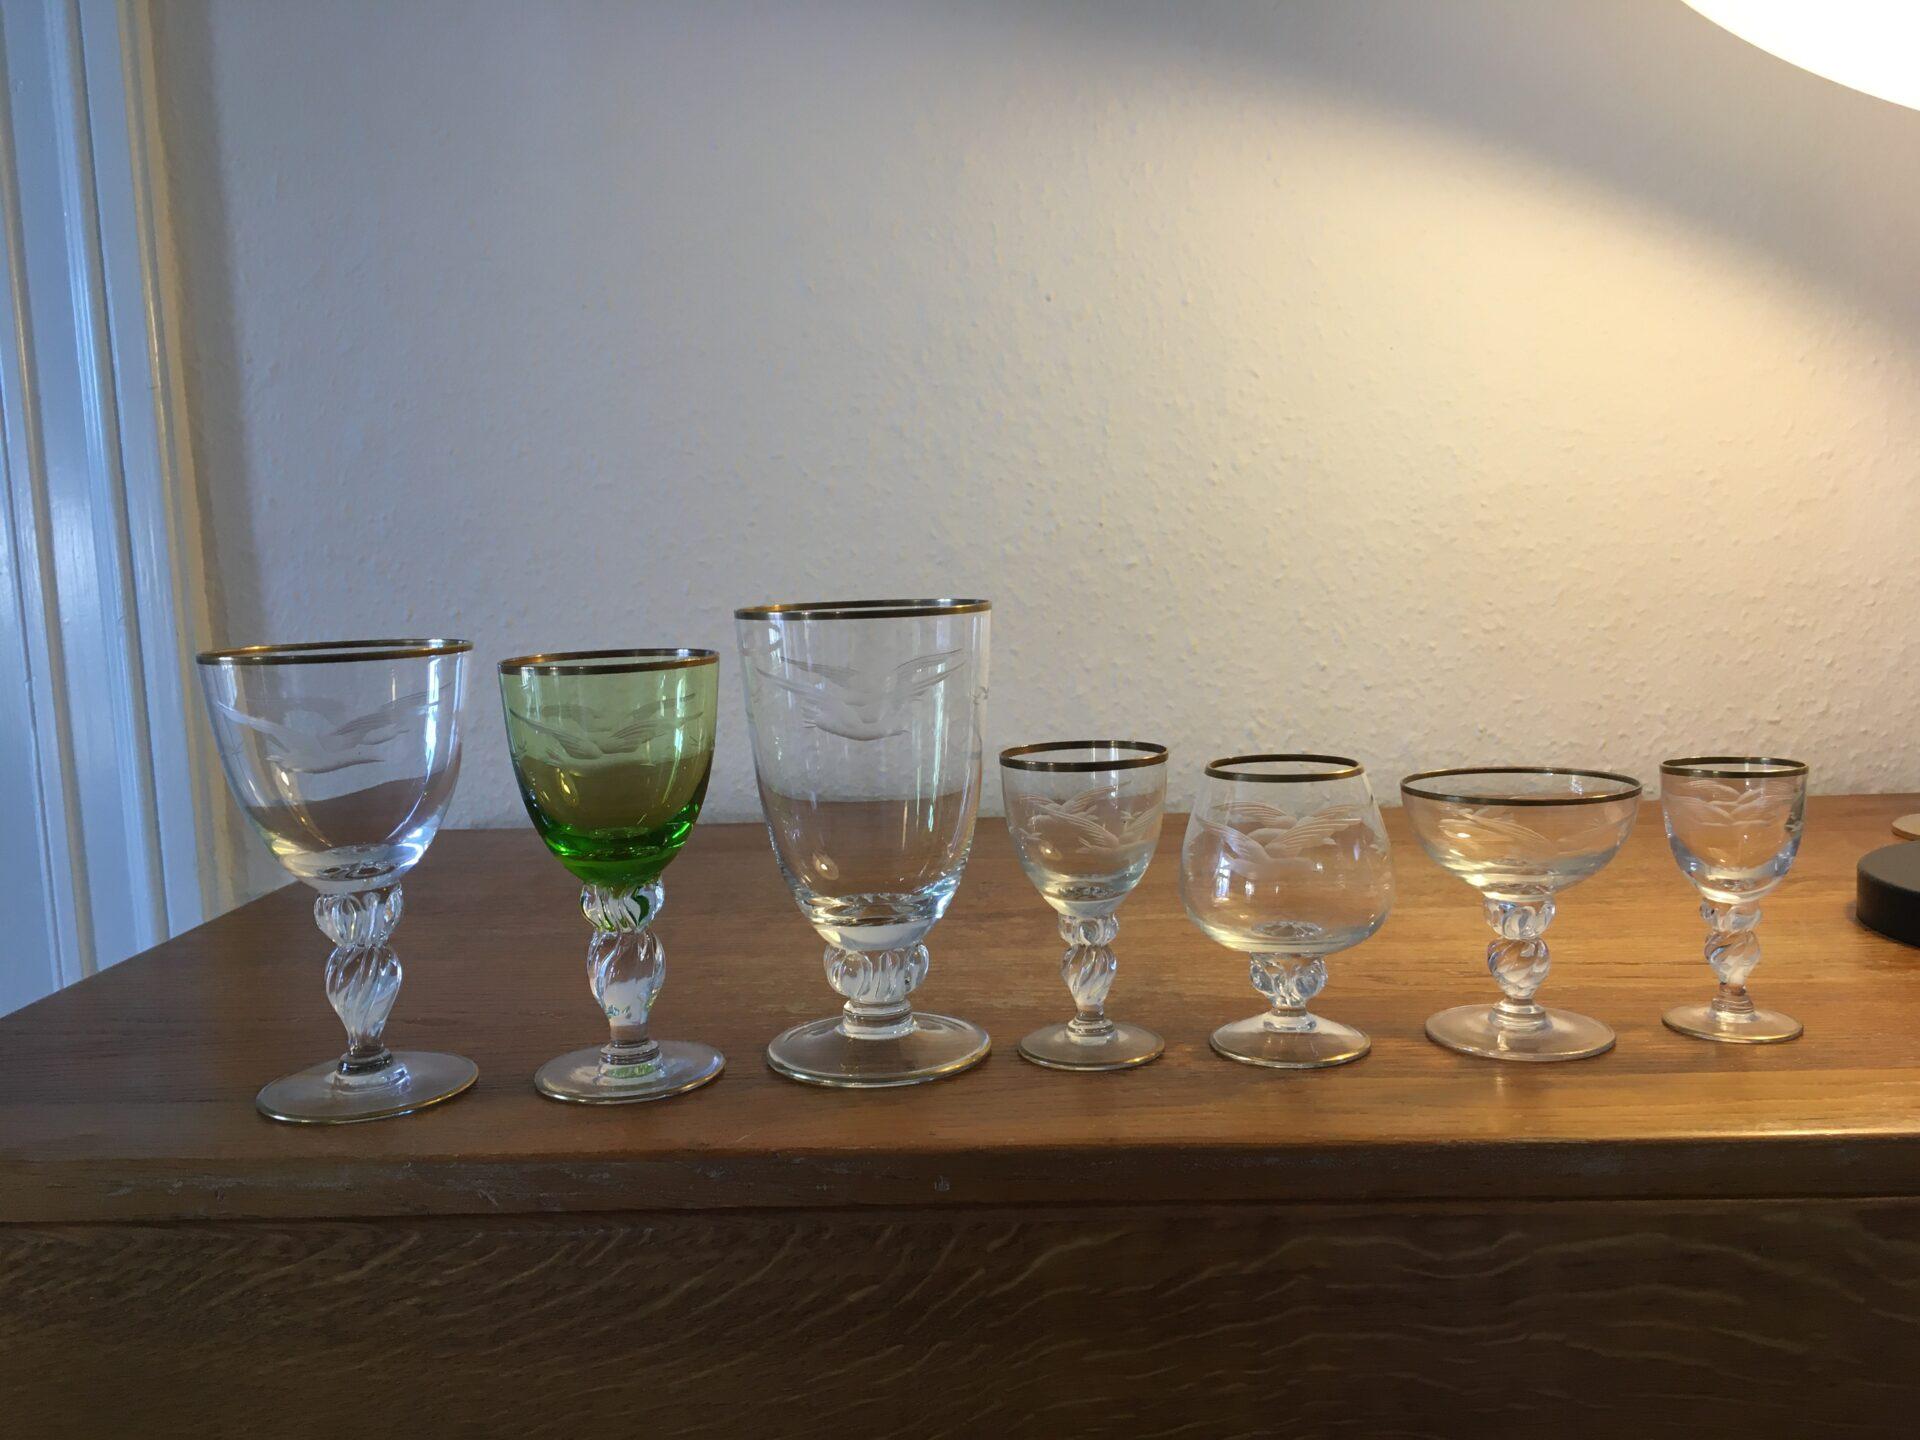 Lyngby, Måge glasservice til 6 personer (42 glas i alt), velholdt og fejlfri. Samlet pris 2000kr